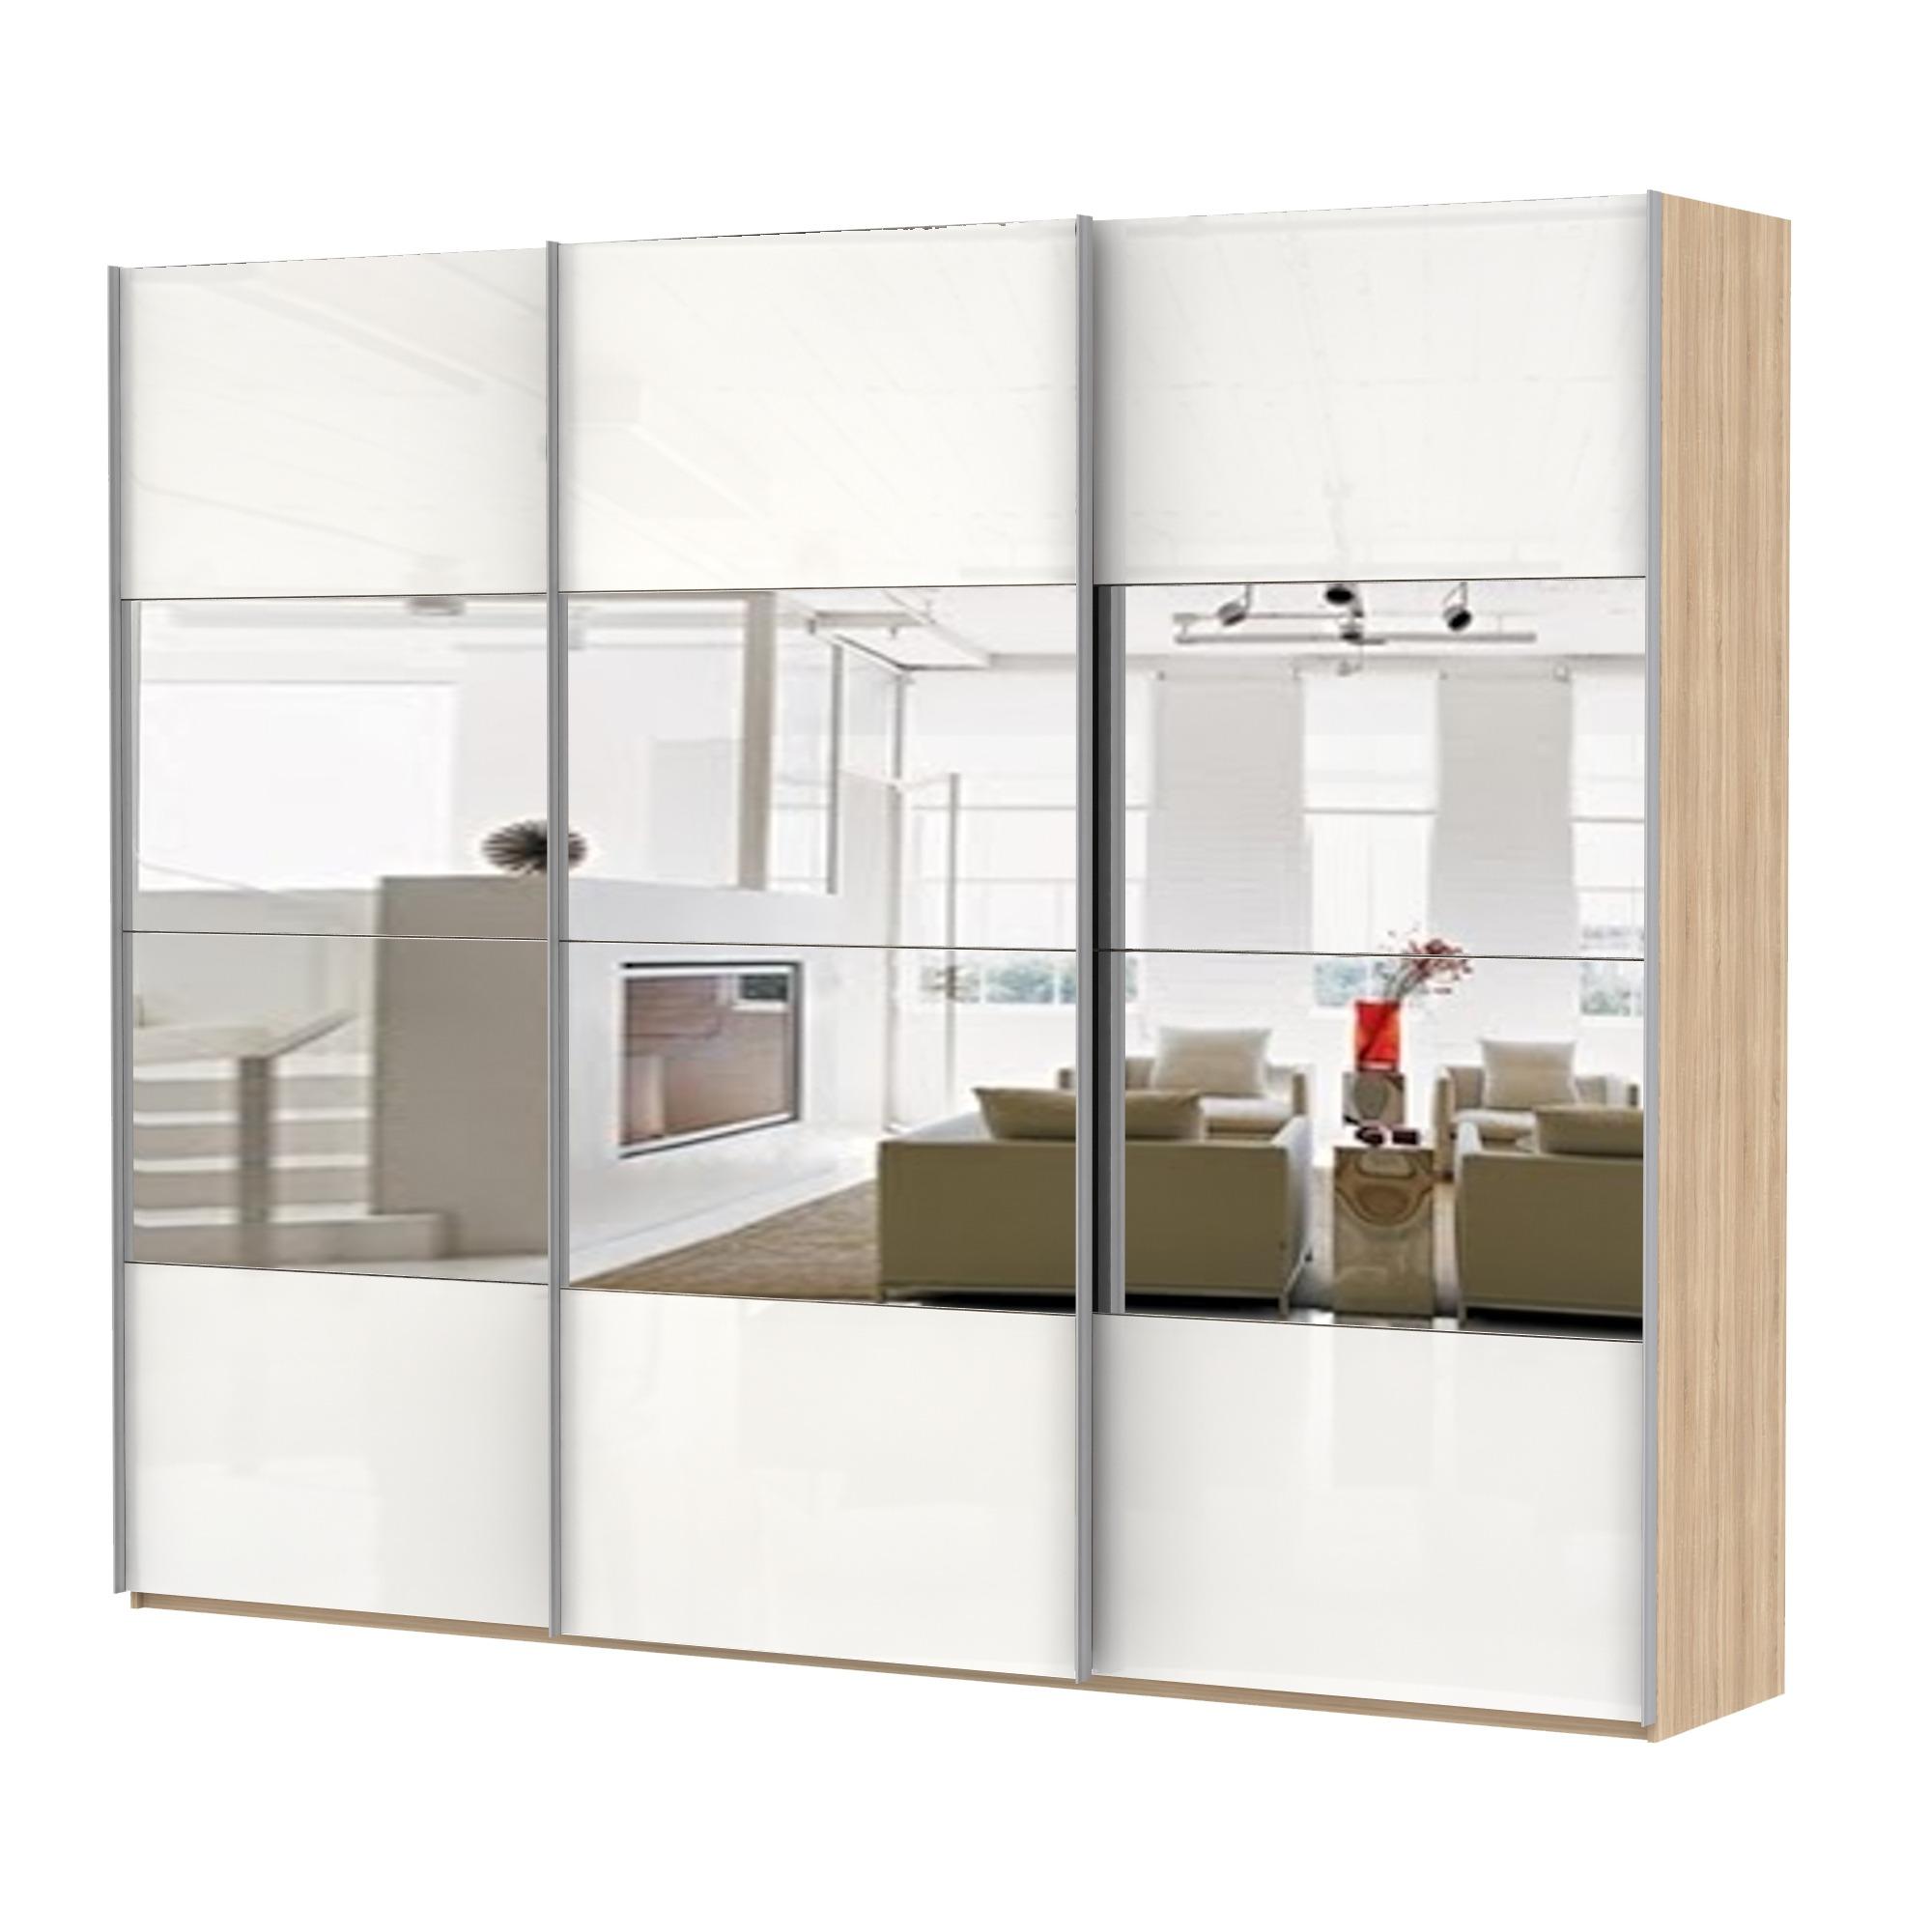 Шкаф Эста трио Комби стекло белое+зеркало 2200 x 3000 x 580Шкафы-купе<br><br><br>Длина мм: 3000<br>Высота мм: 2200<br>Глубина мм: 580